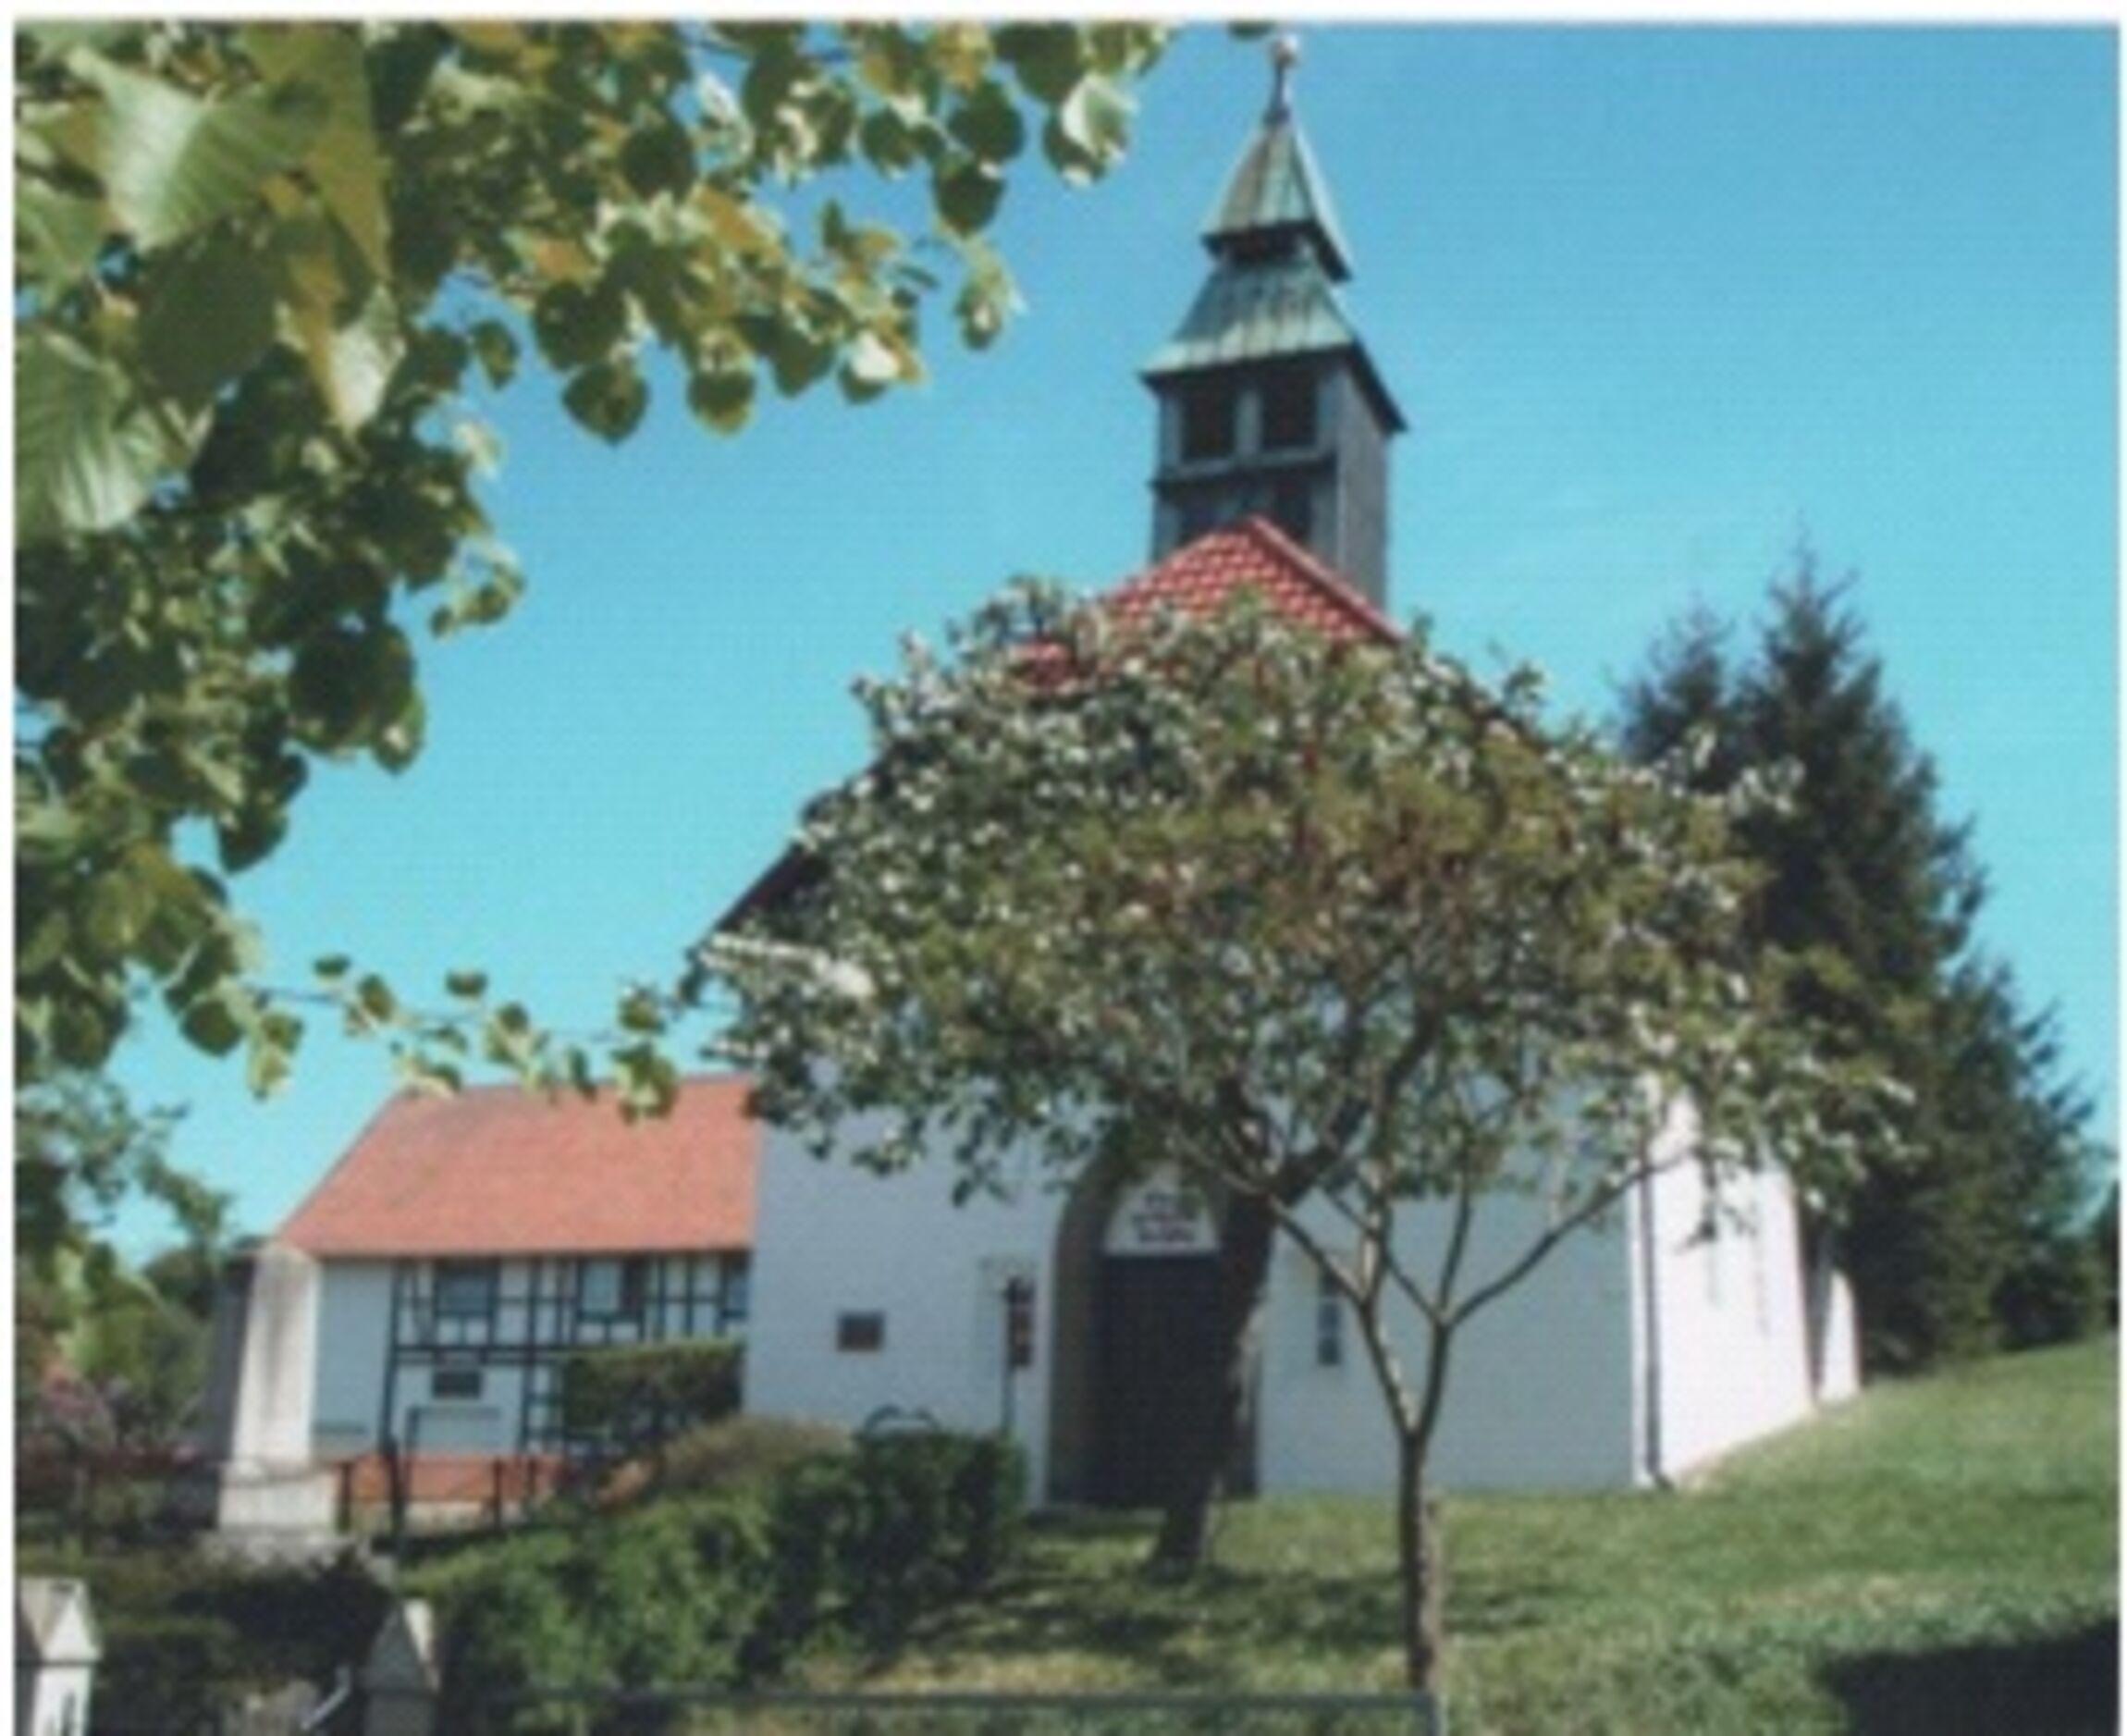 Dating-Ort fГјr die Kirche des Christen